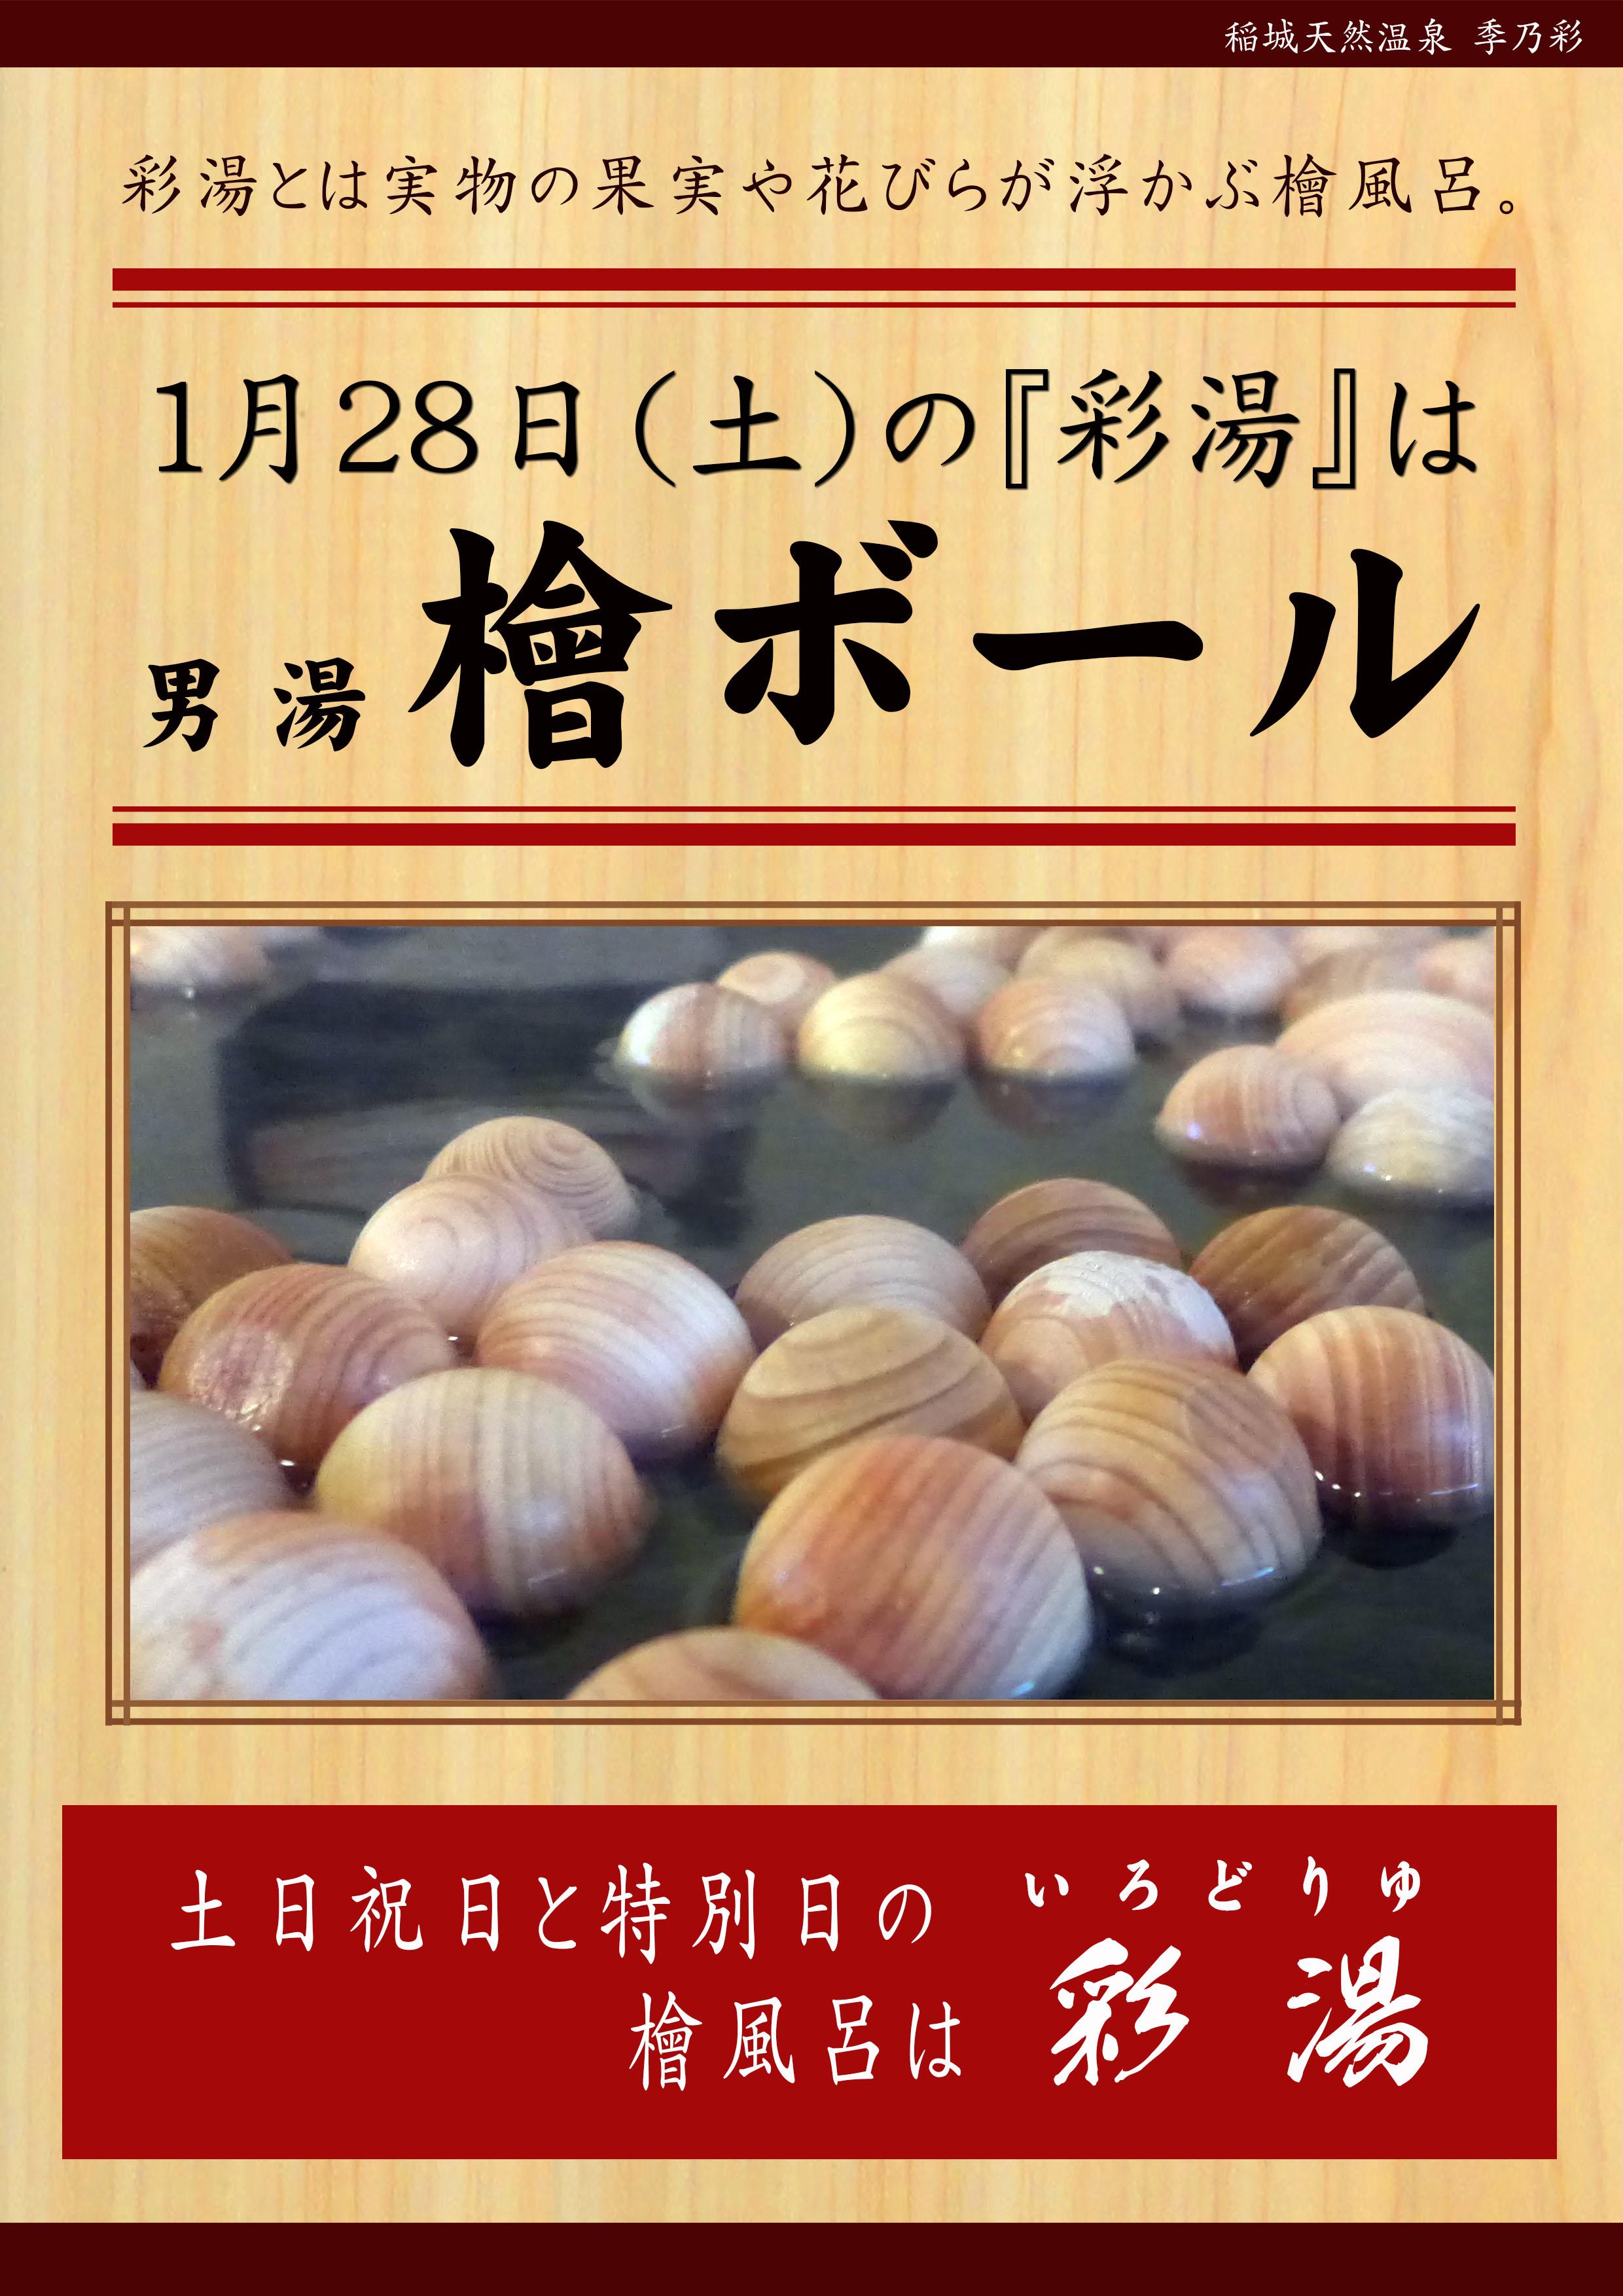 20170128POP イベント 彩湯 男湯 檜ボール